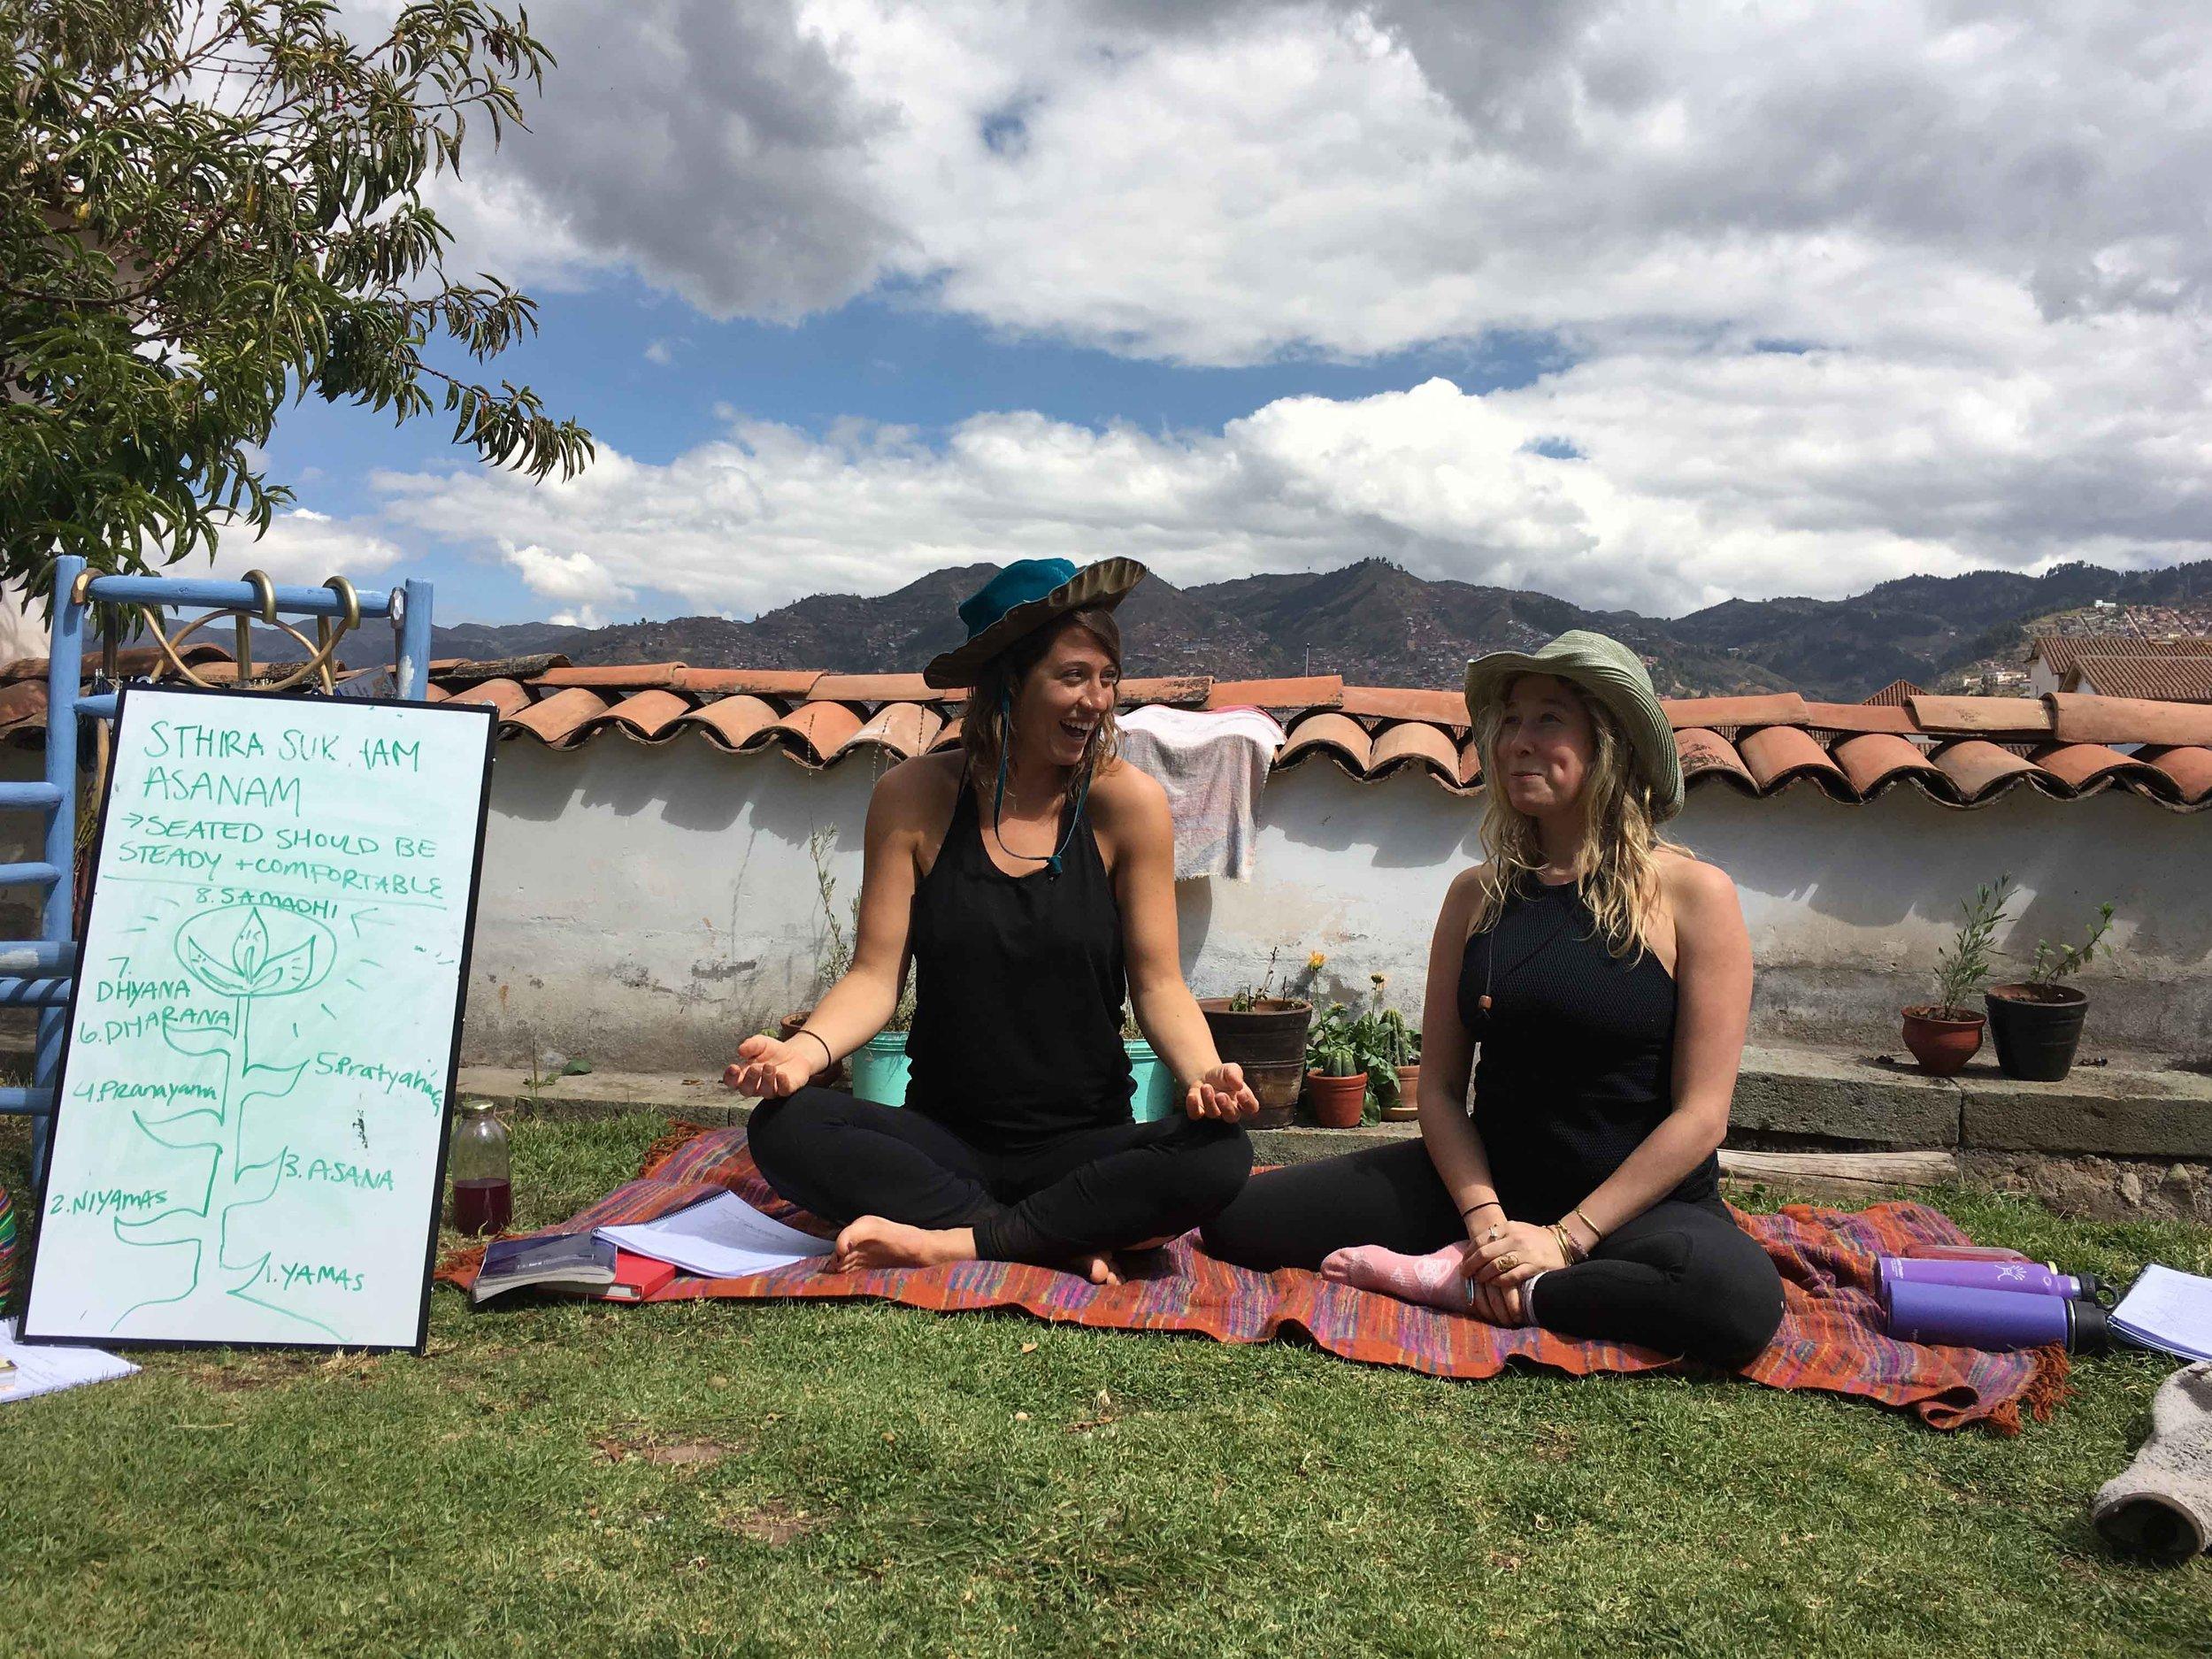 Durga-Excursions-yin-yoga-teacher-training_11.JPG